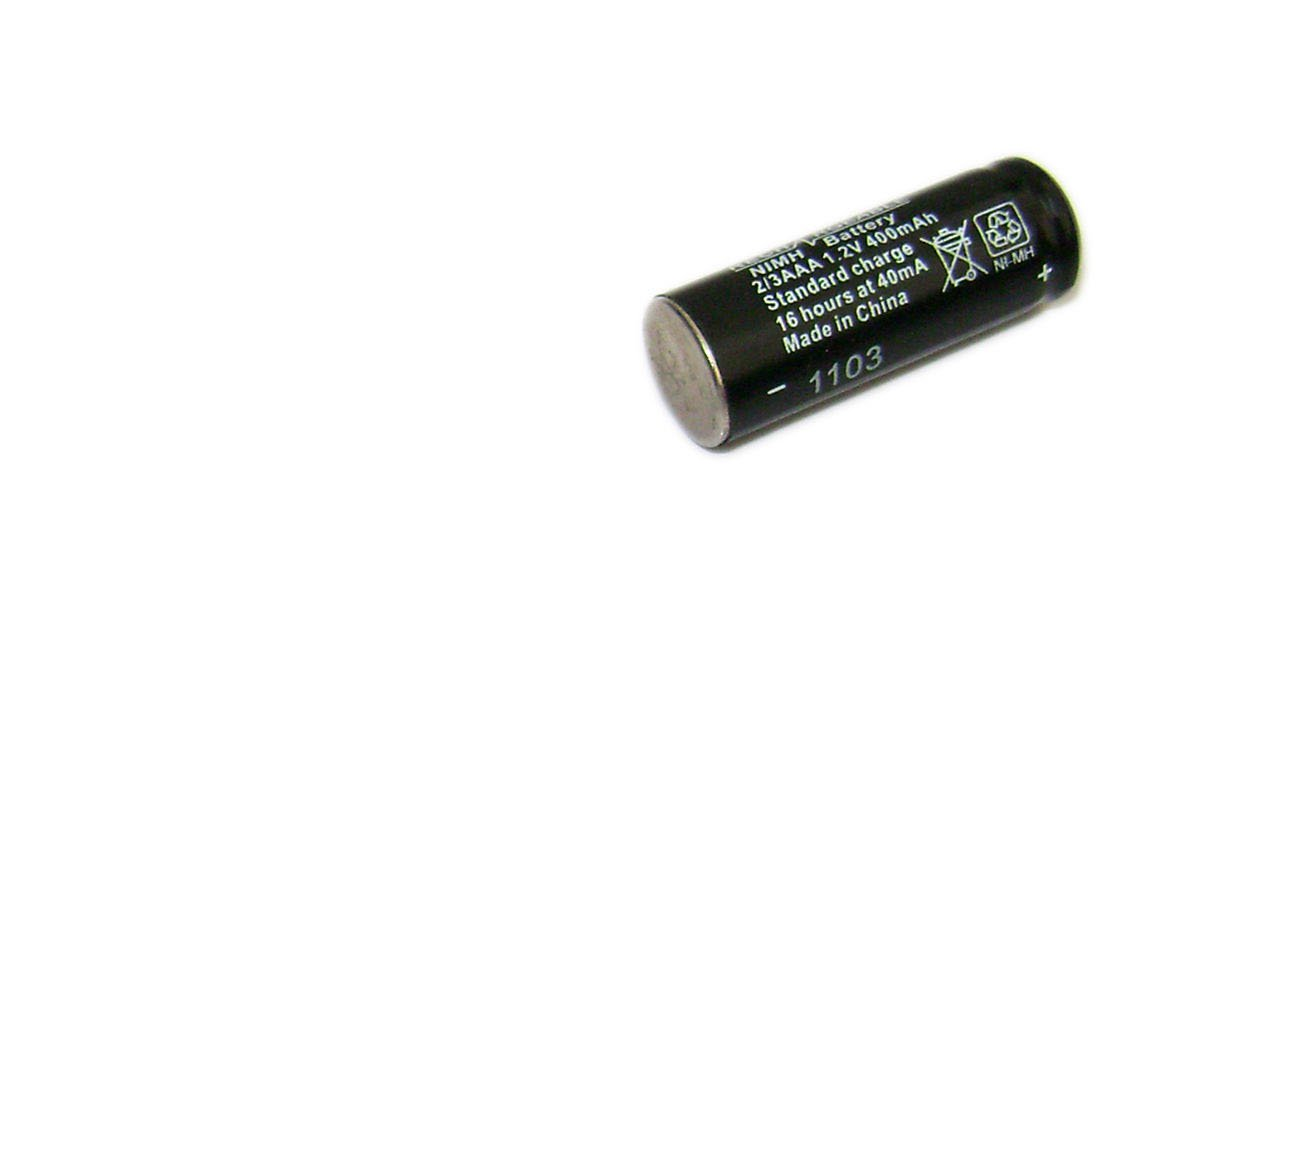 100 x iDect x1 / x1iコードレス電話バッテリー2 / 3aaa 1.2 V 400 mAh 1030 mm B071Z8YGT9